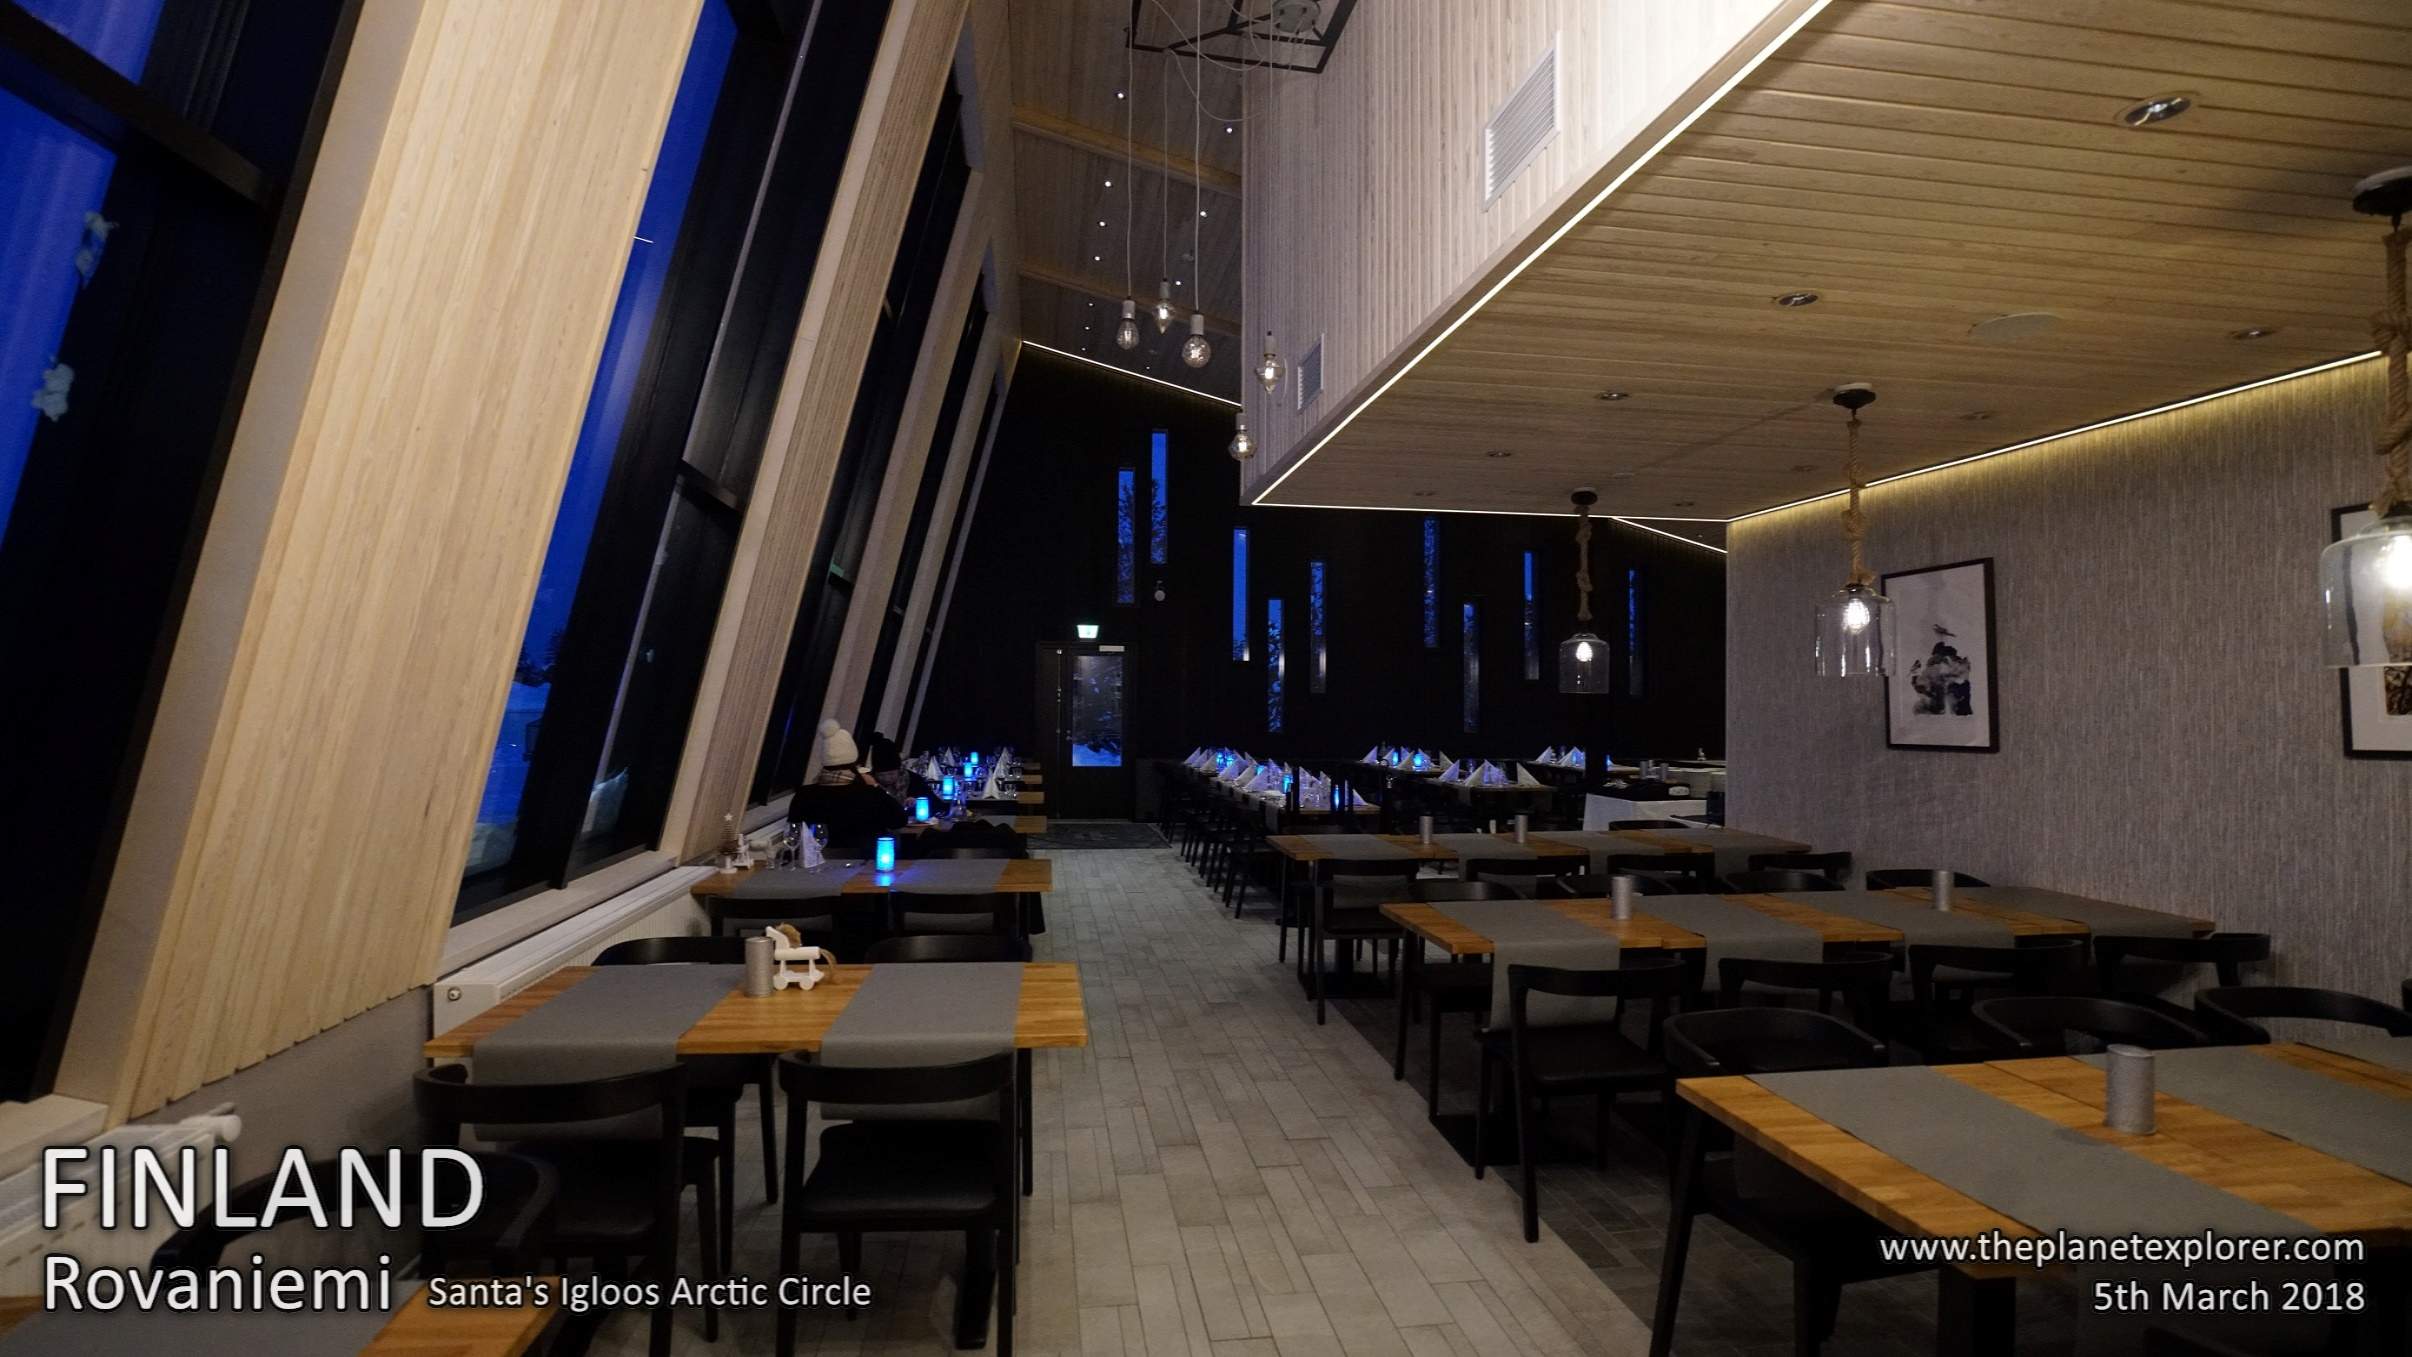 20180305_1824_Finland_Rovaniemi_Santa's Igloos Artic Circle_DSC09589_a7R2_LR_@www